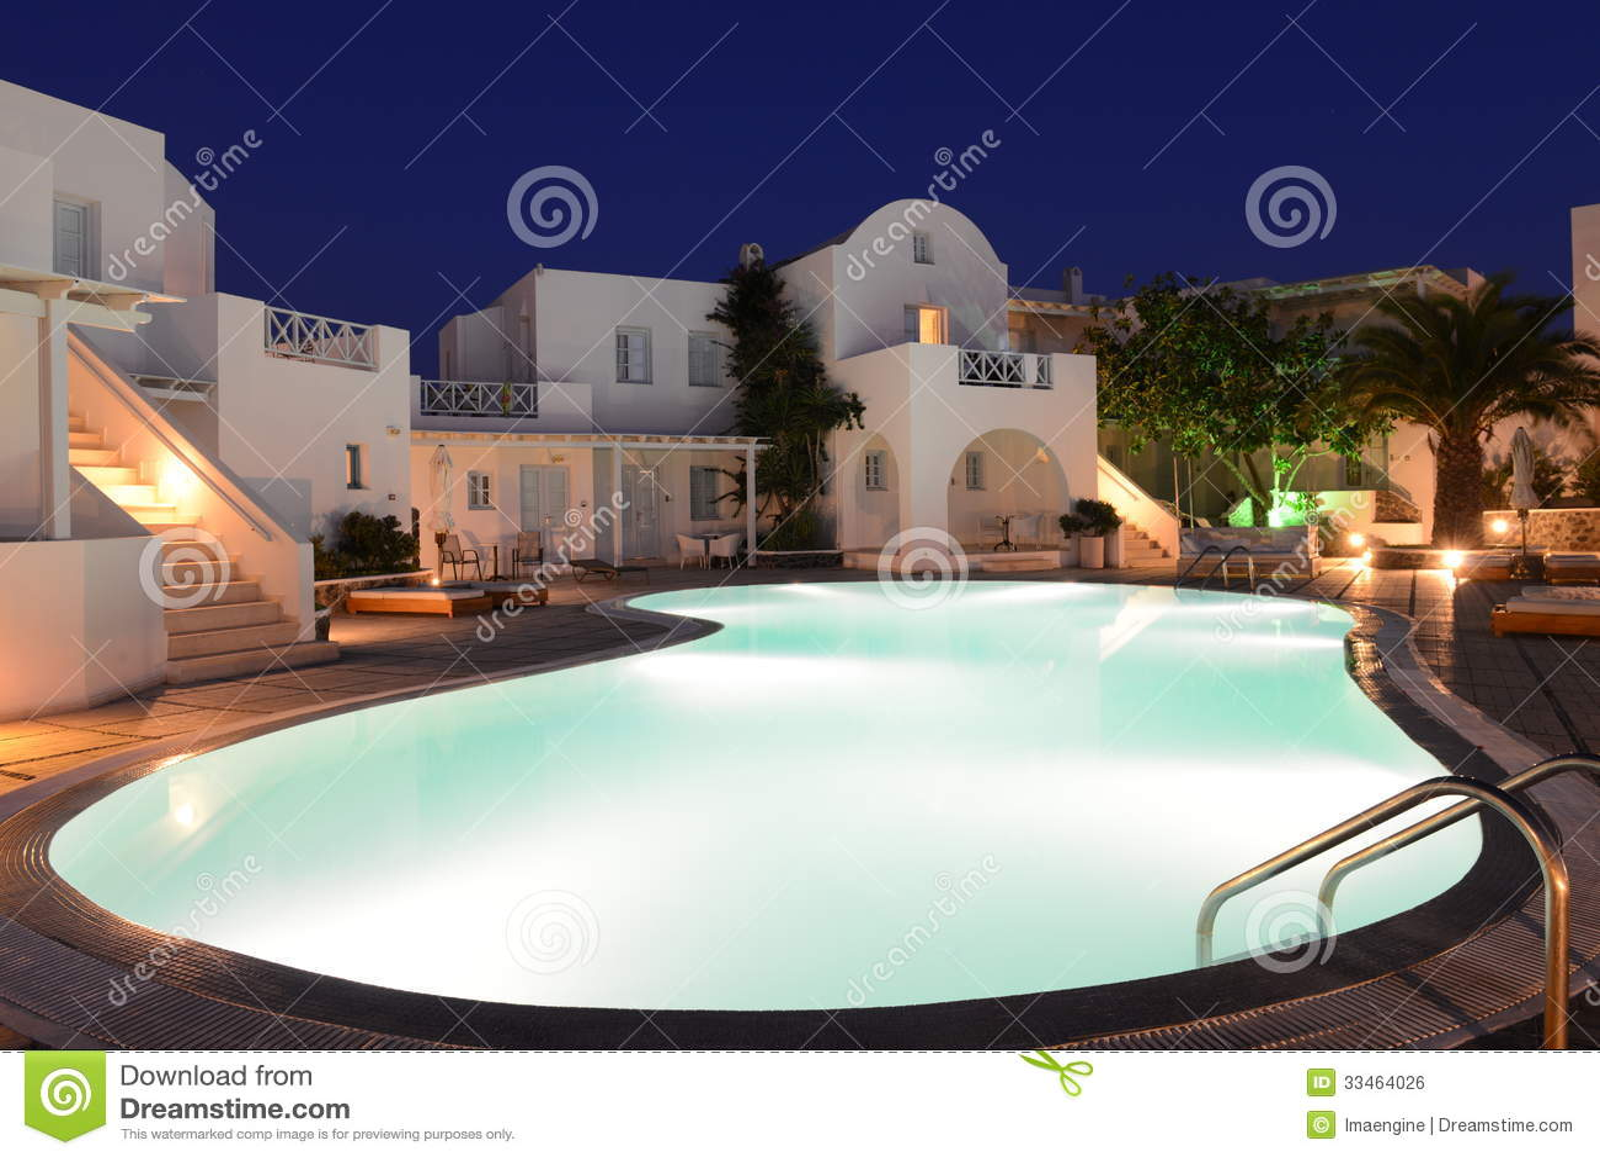 Santorini Luxurious Resort At Night Royalty Free Stock